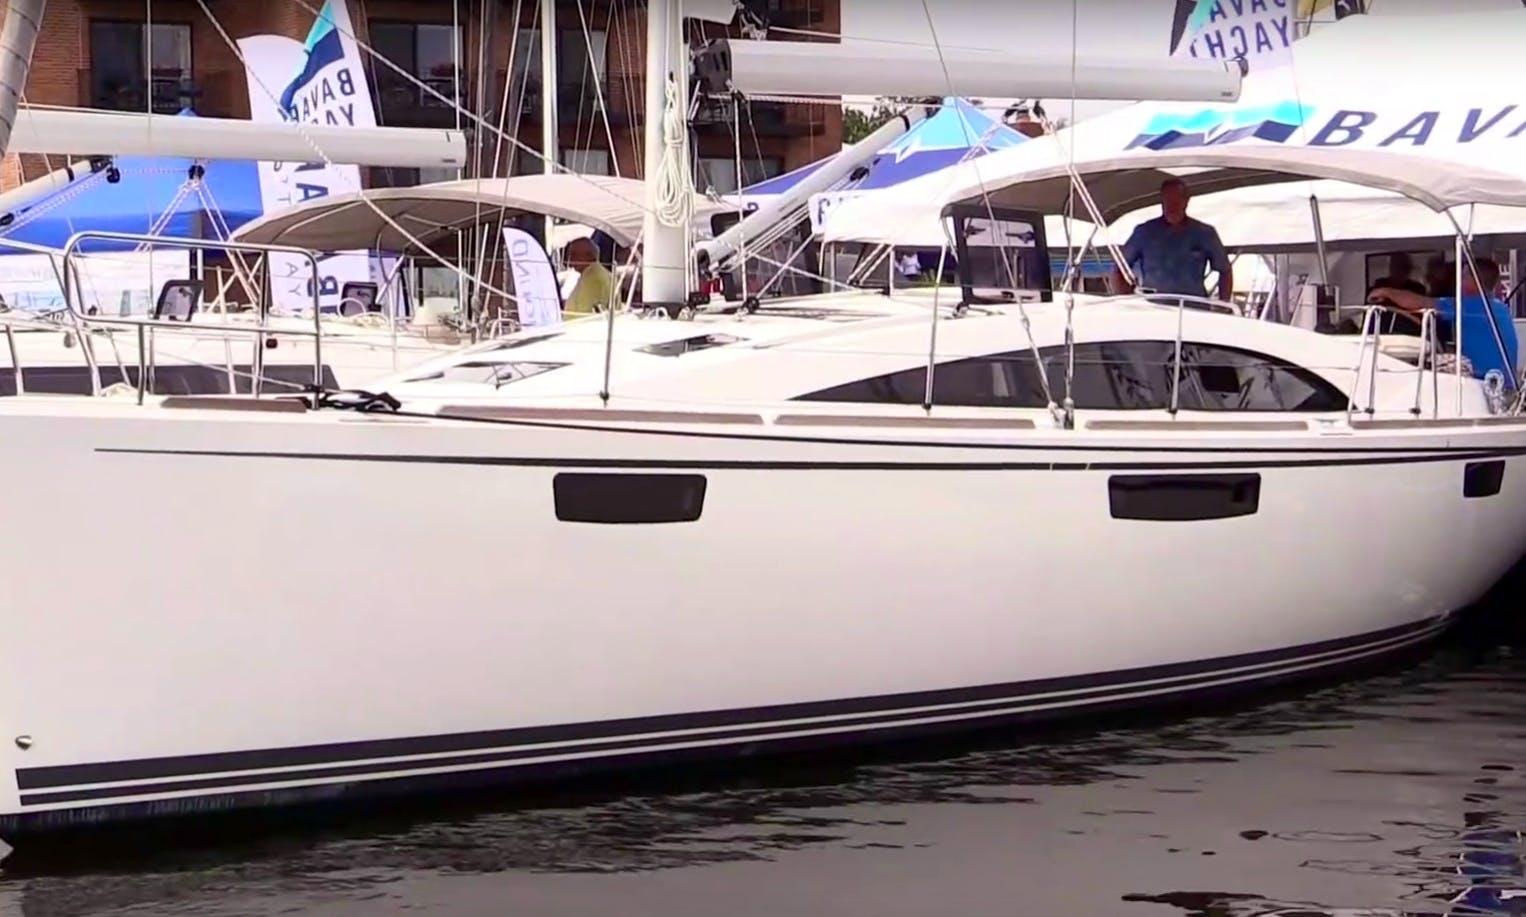 Bavaria Vision 40 Sailboat Rental in Taganrog